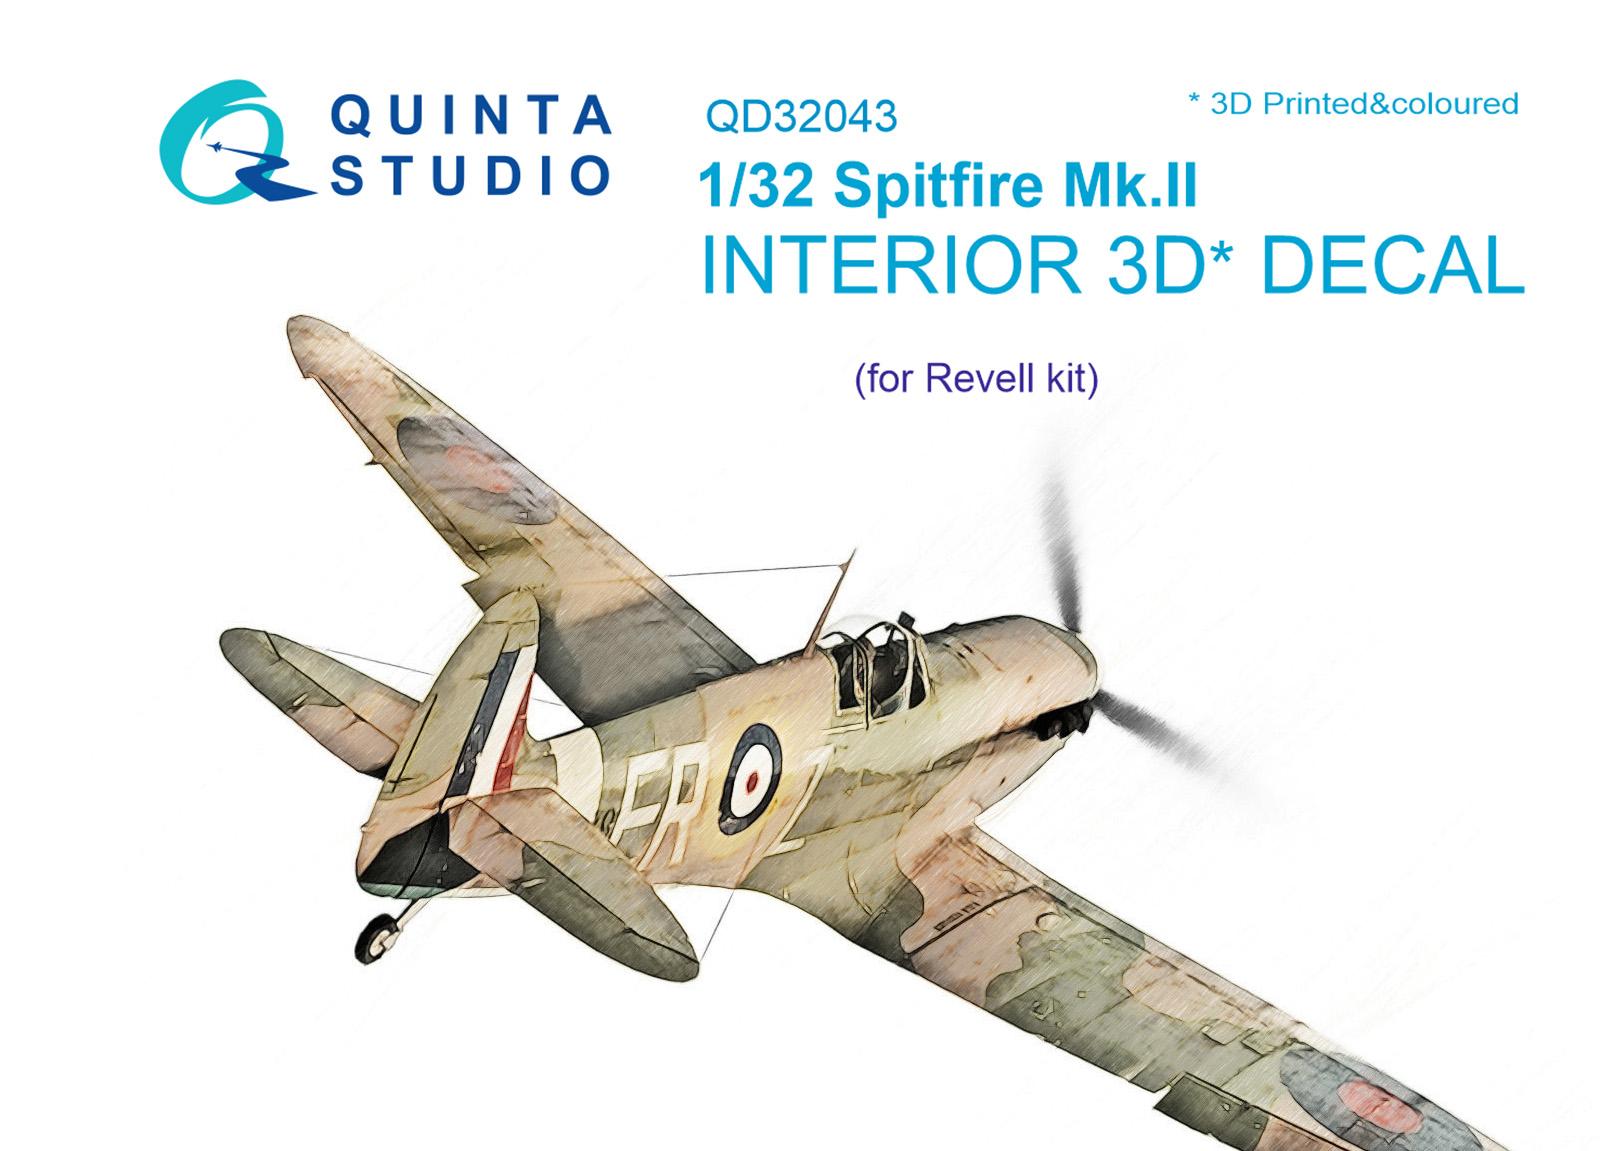 QD32043